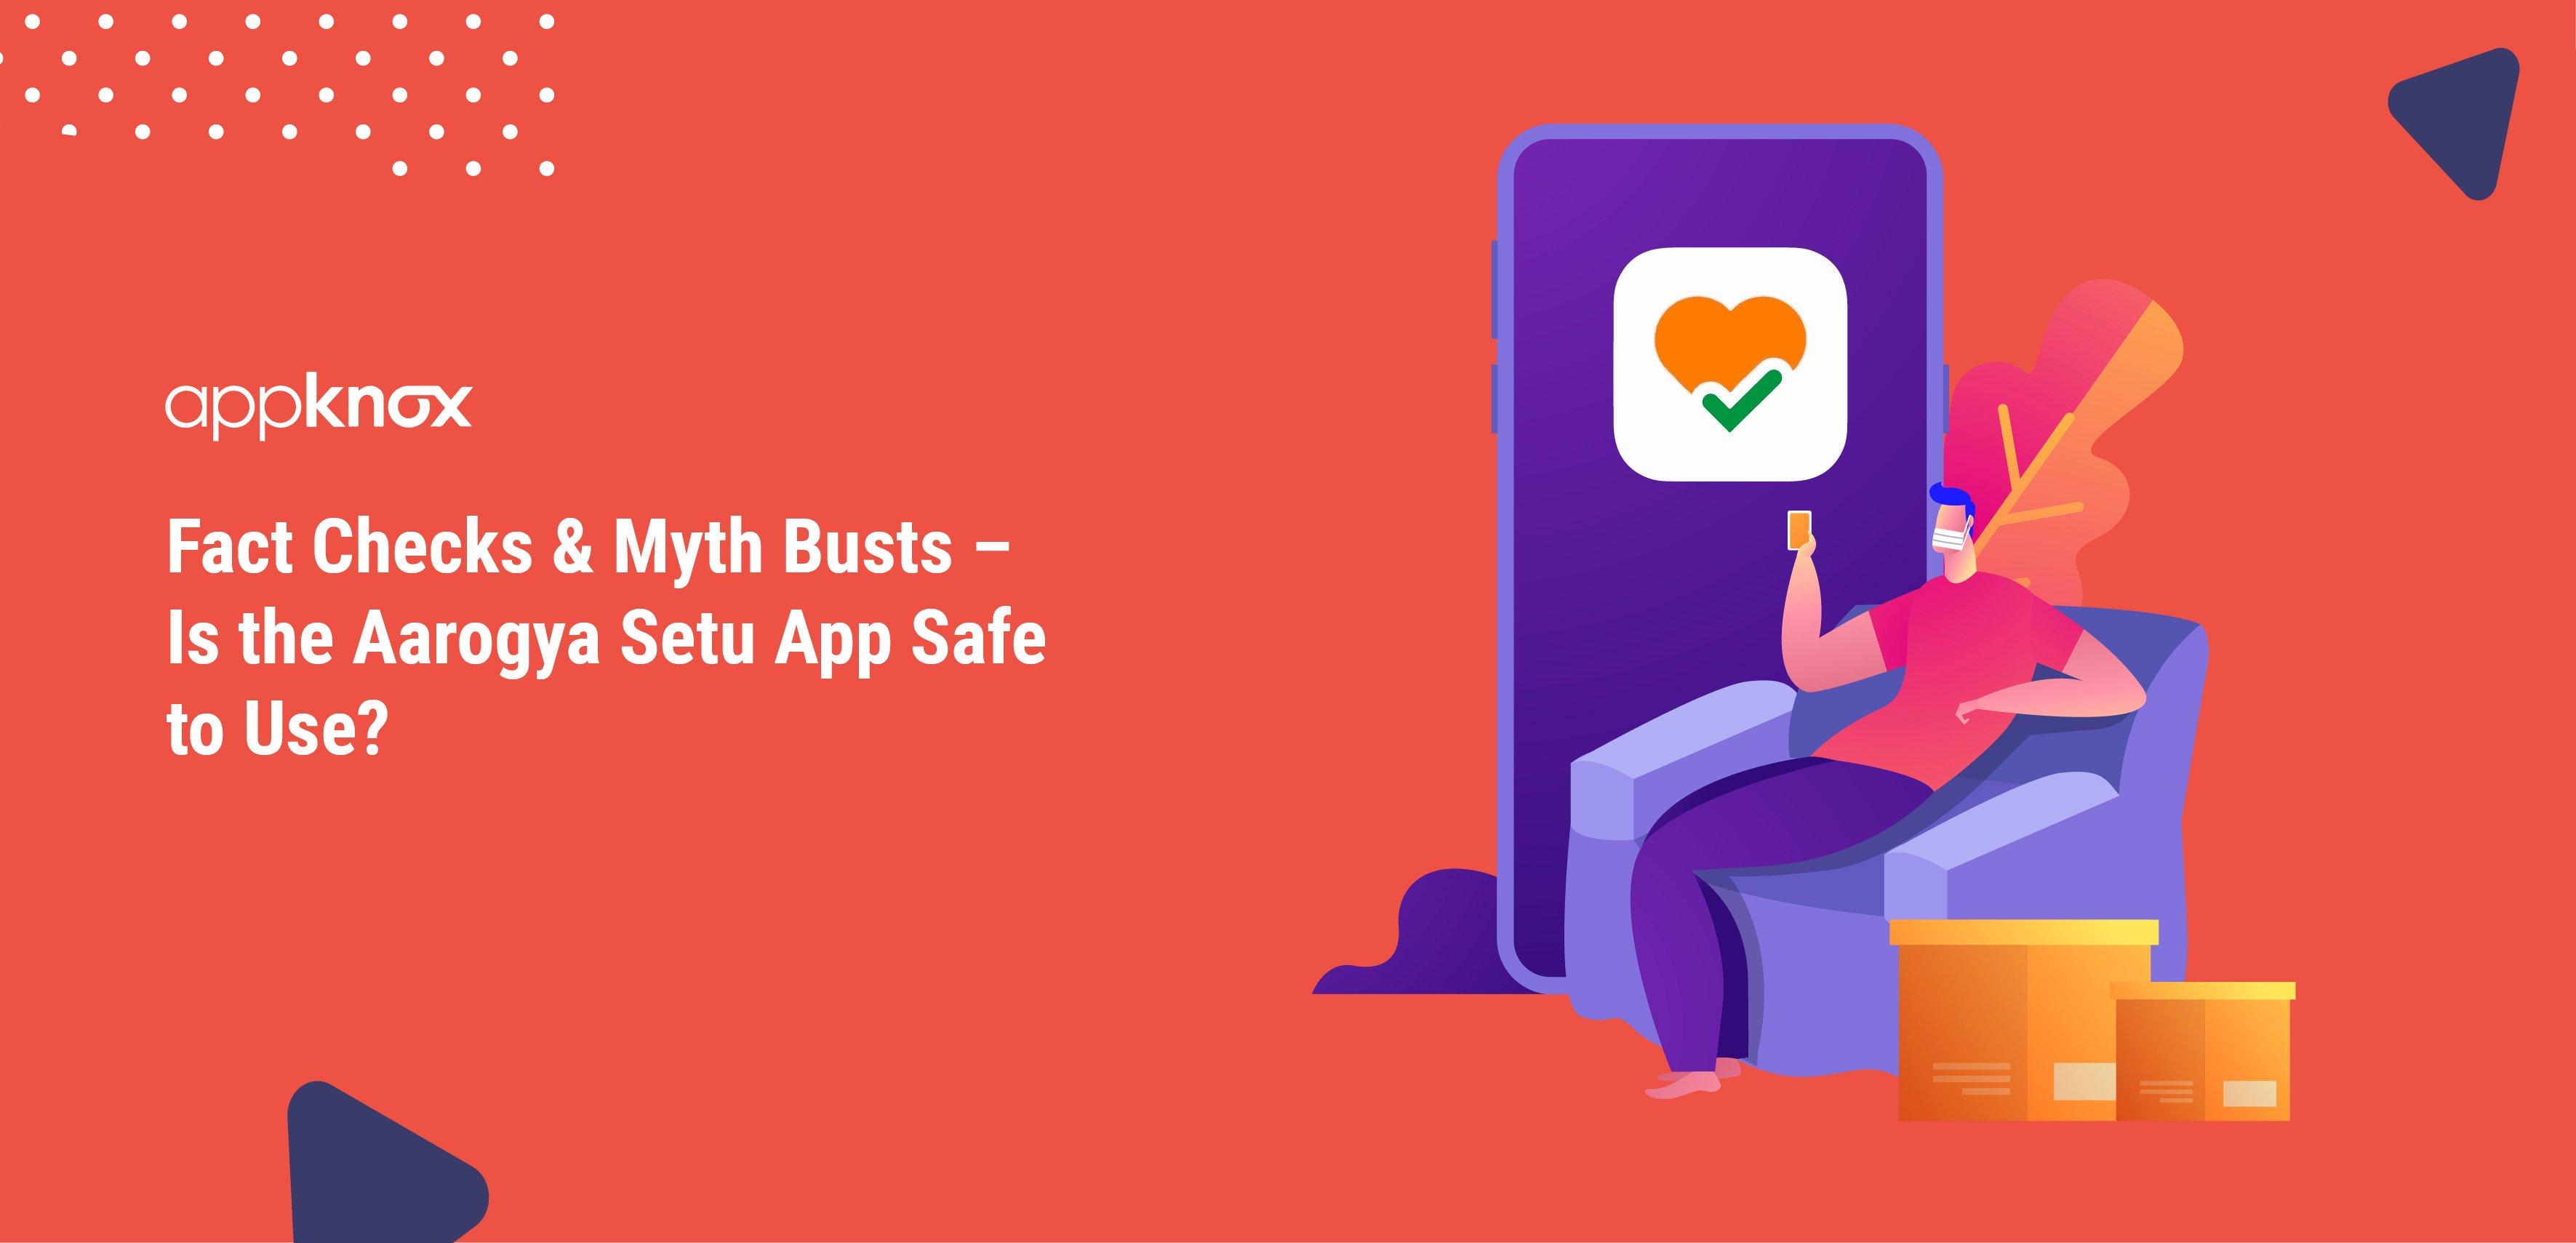 Is the Aarogya Setu App Safe to Use?